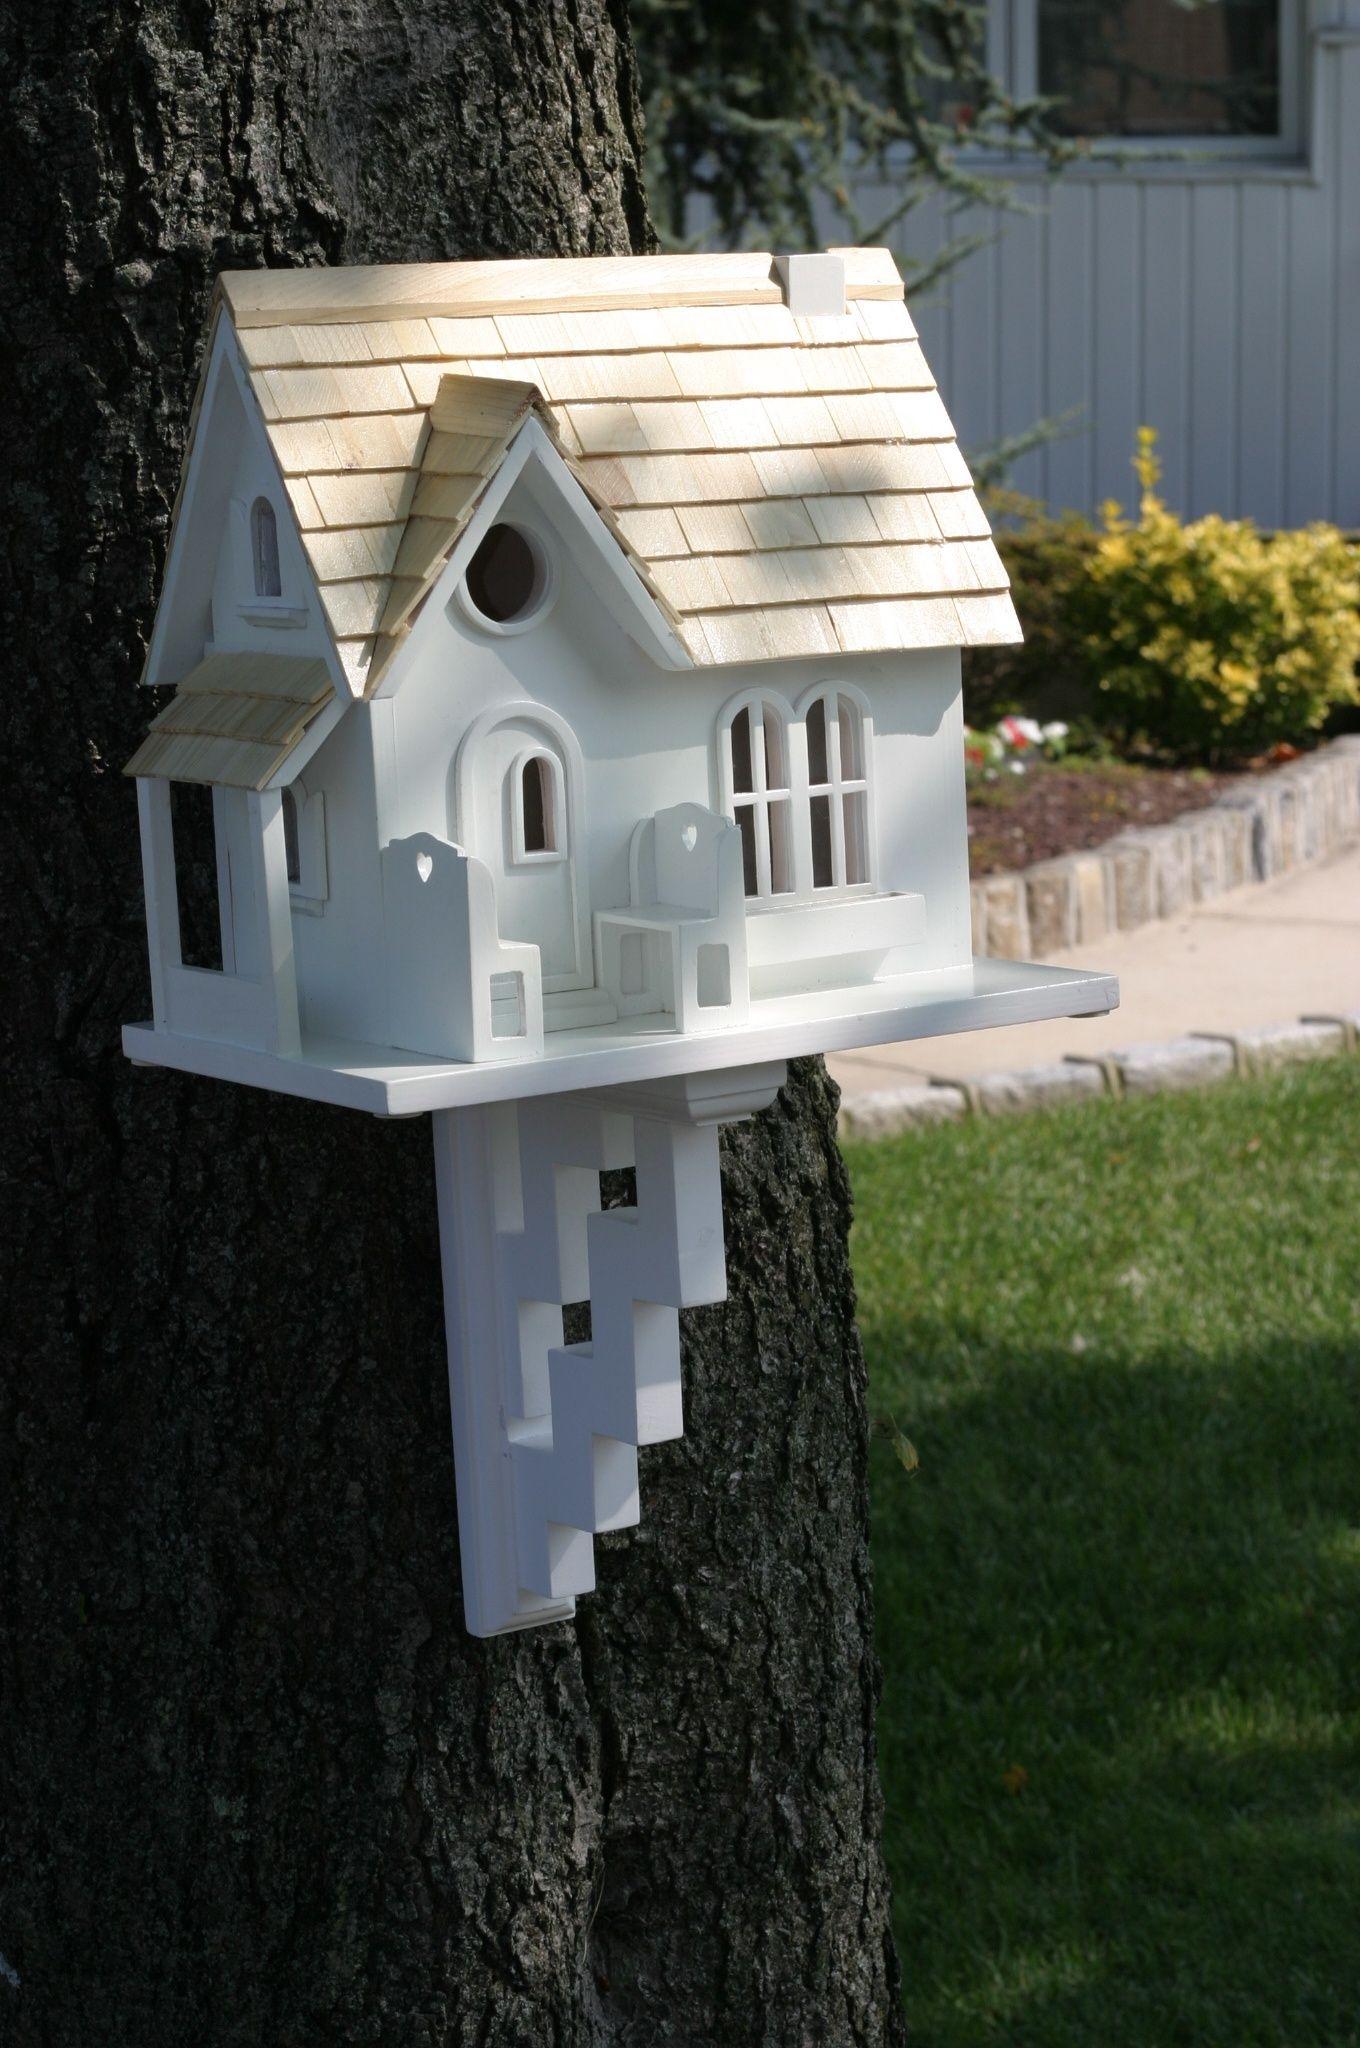 Cottage+Birdhouse | Home Bazaar Cozy Cottage Birdhouse ...